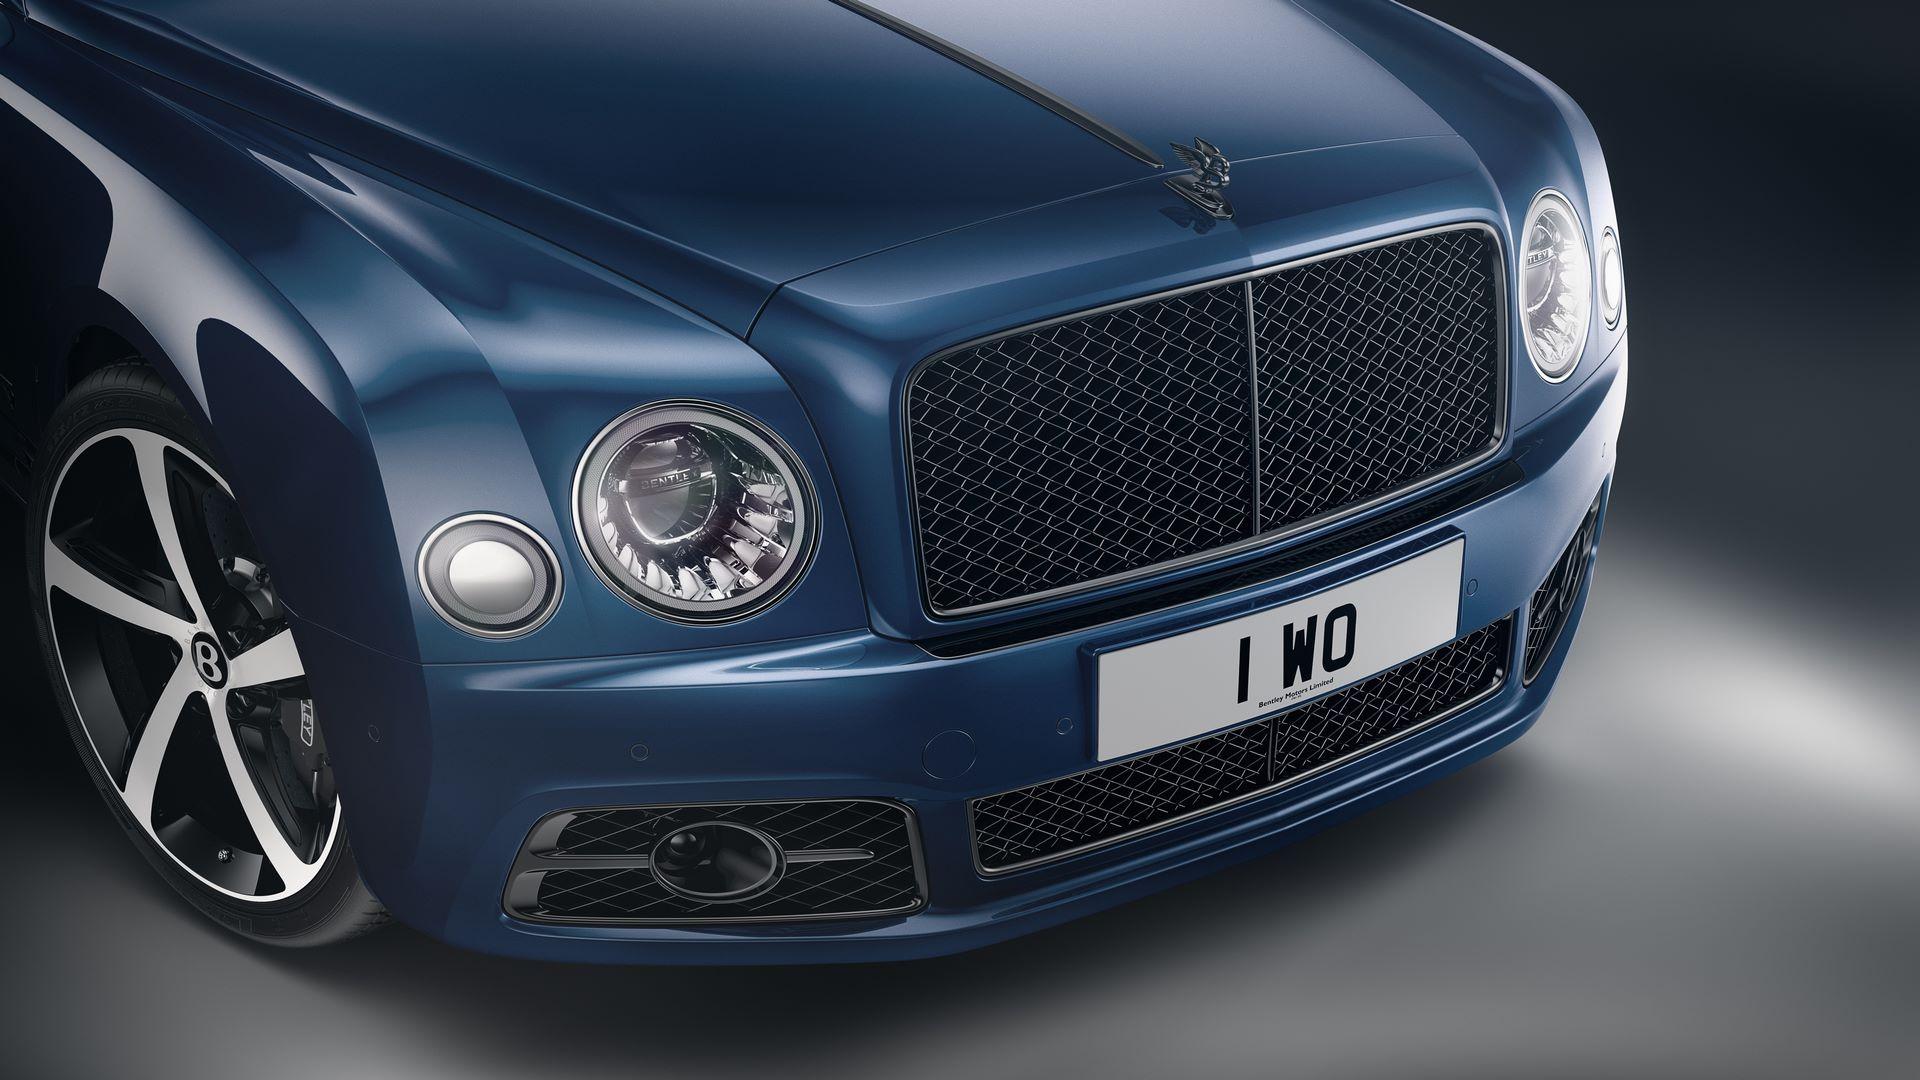 Bentley-Mulsanne-6.75-Edition-By-Mulliner-4